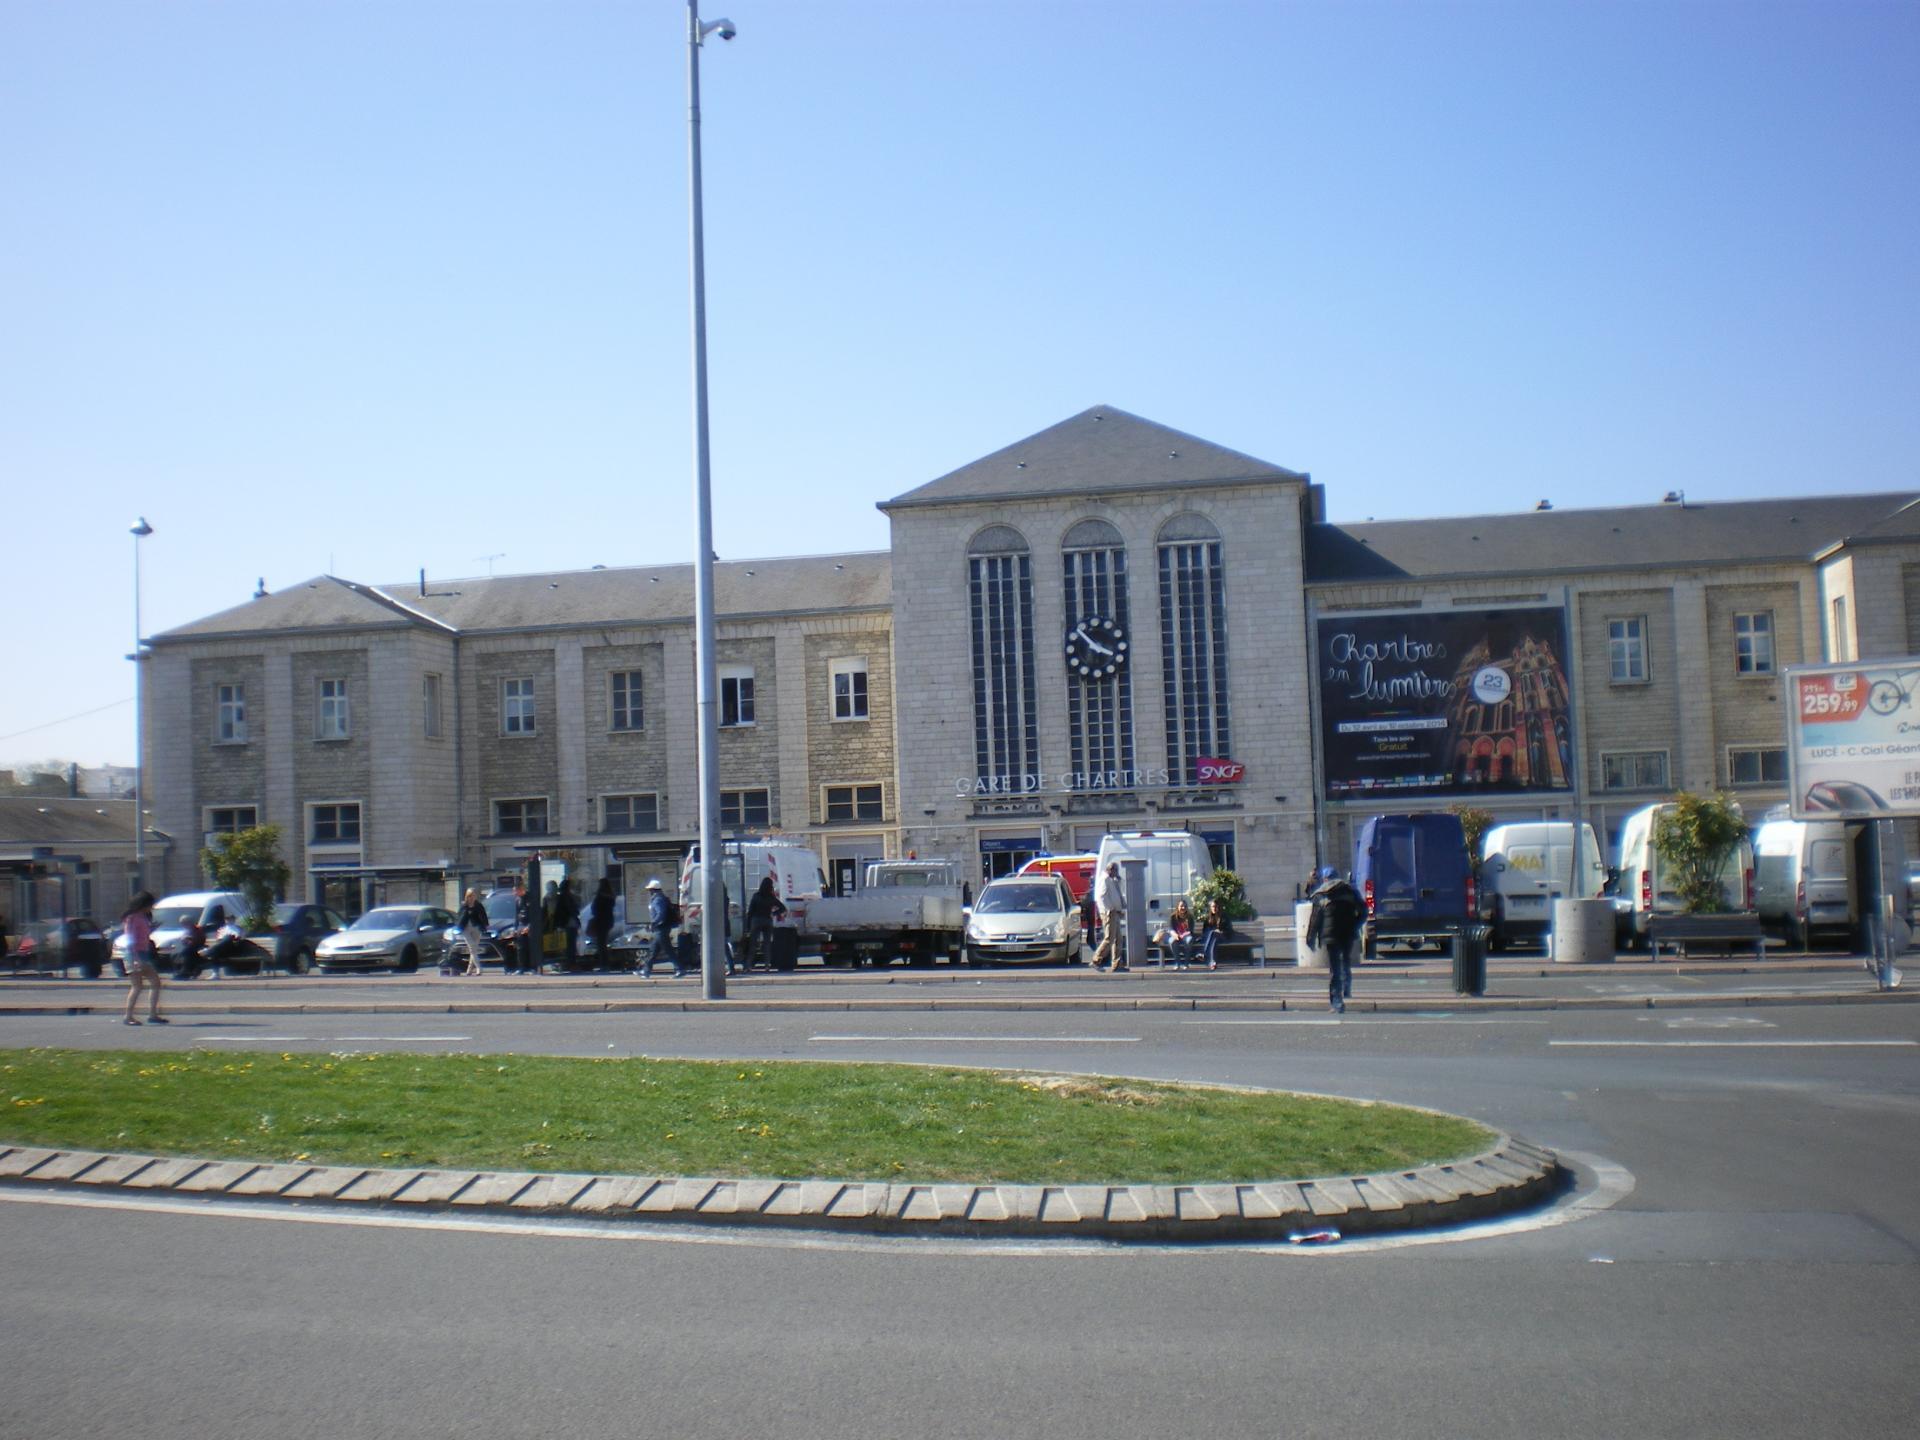 Gare chartres 1